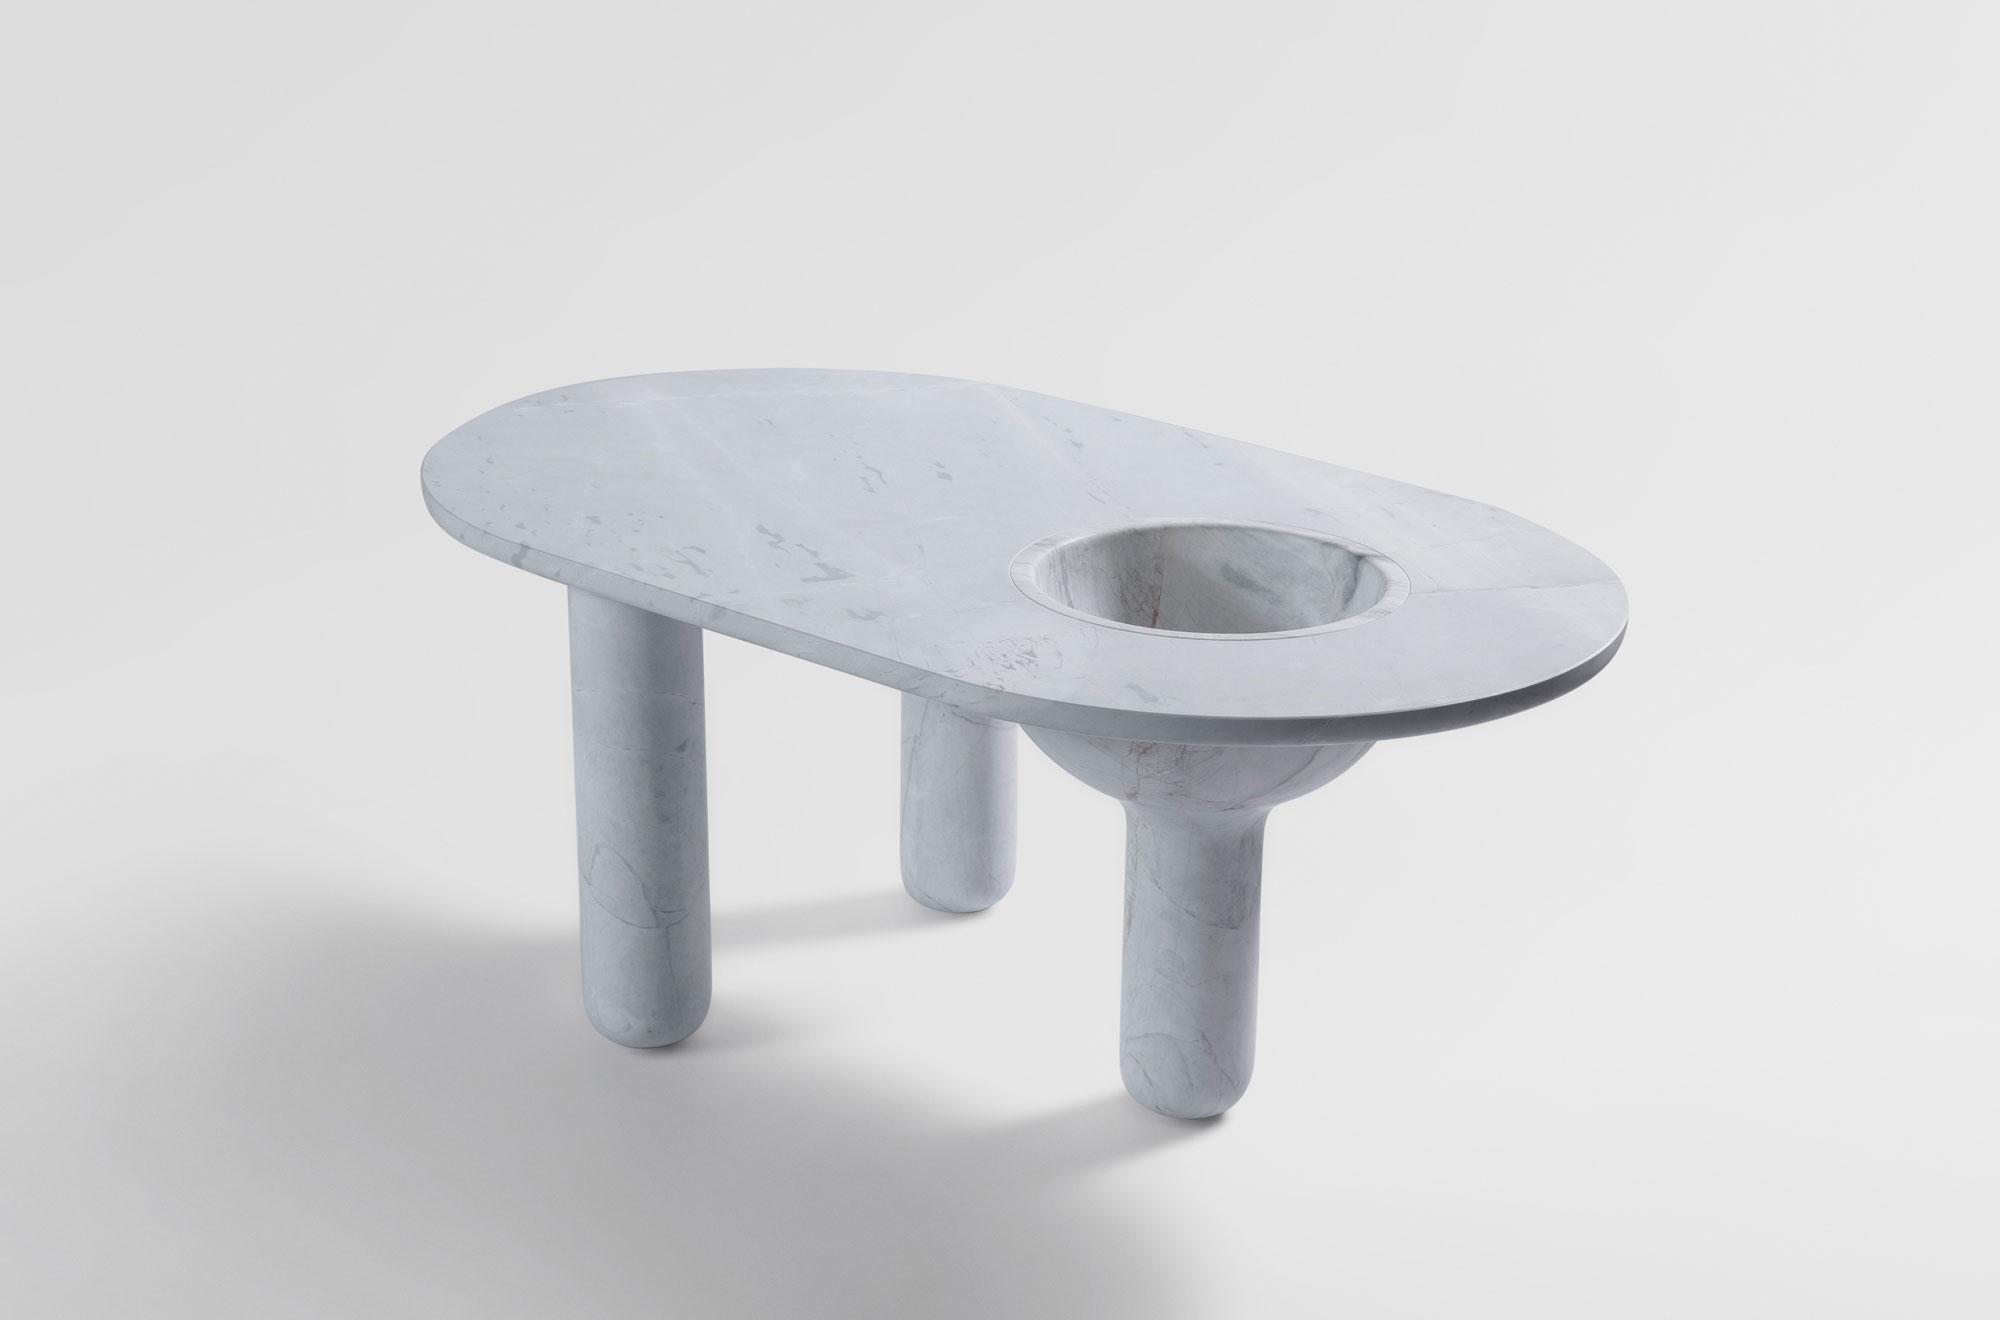 New_Volumes_Artedomus_three_leg_table